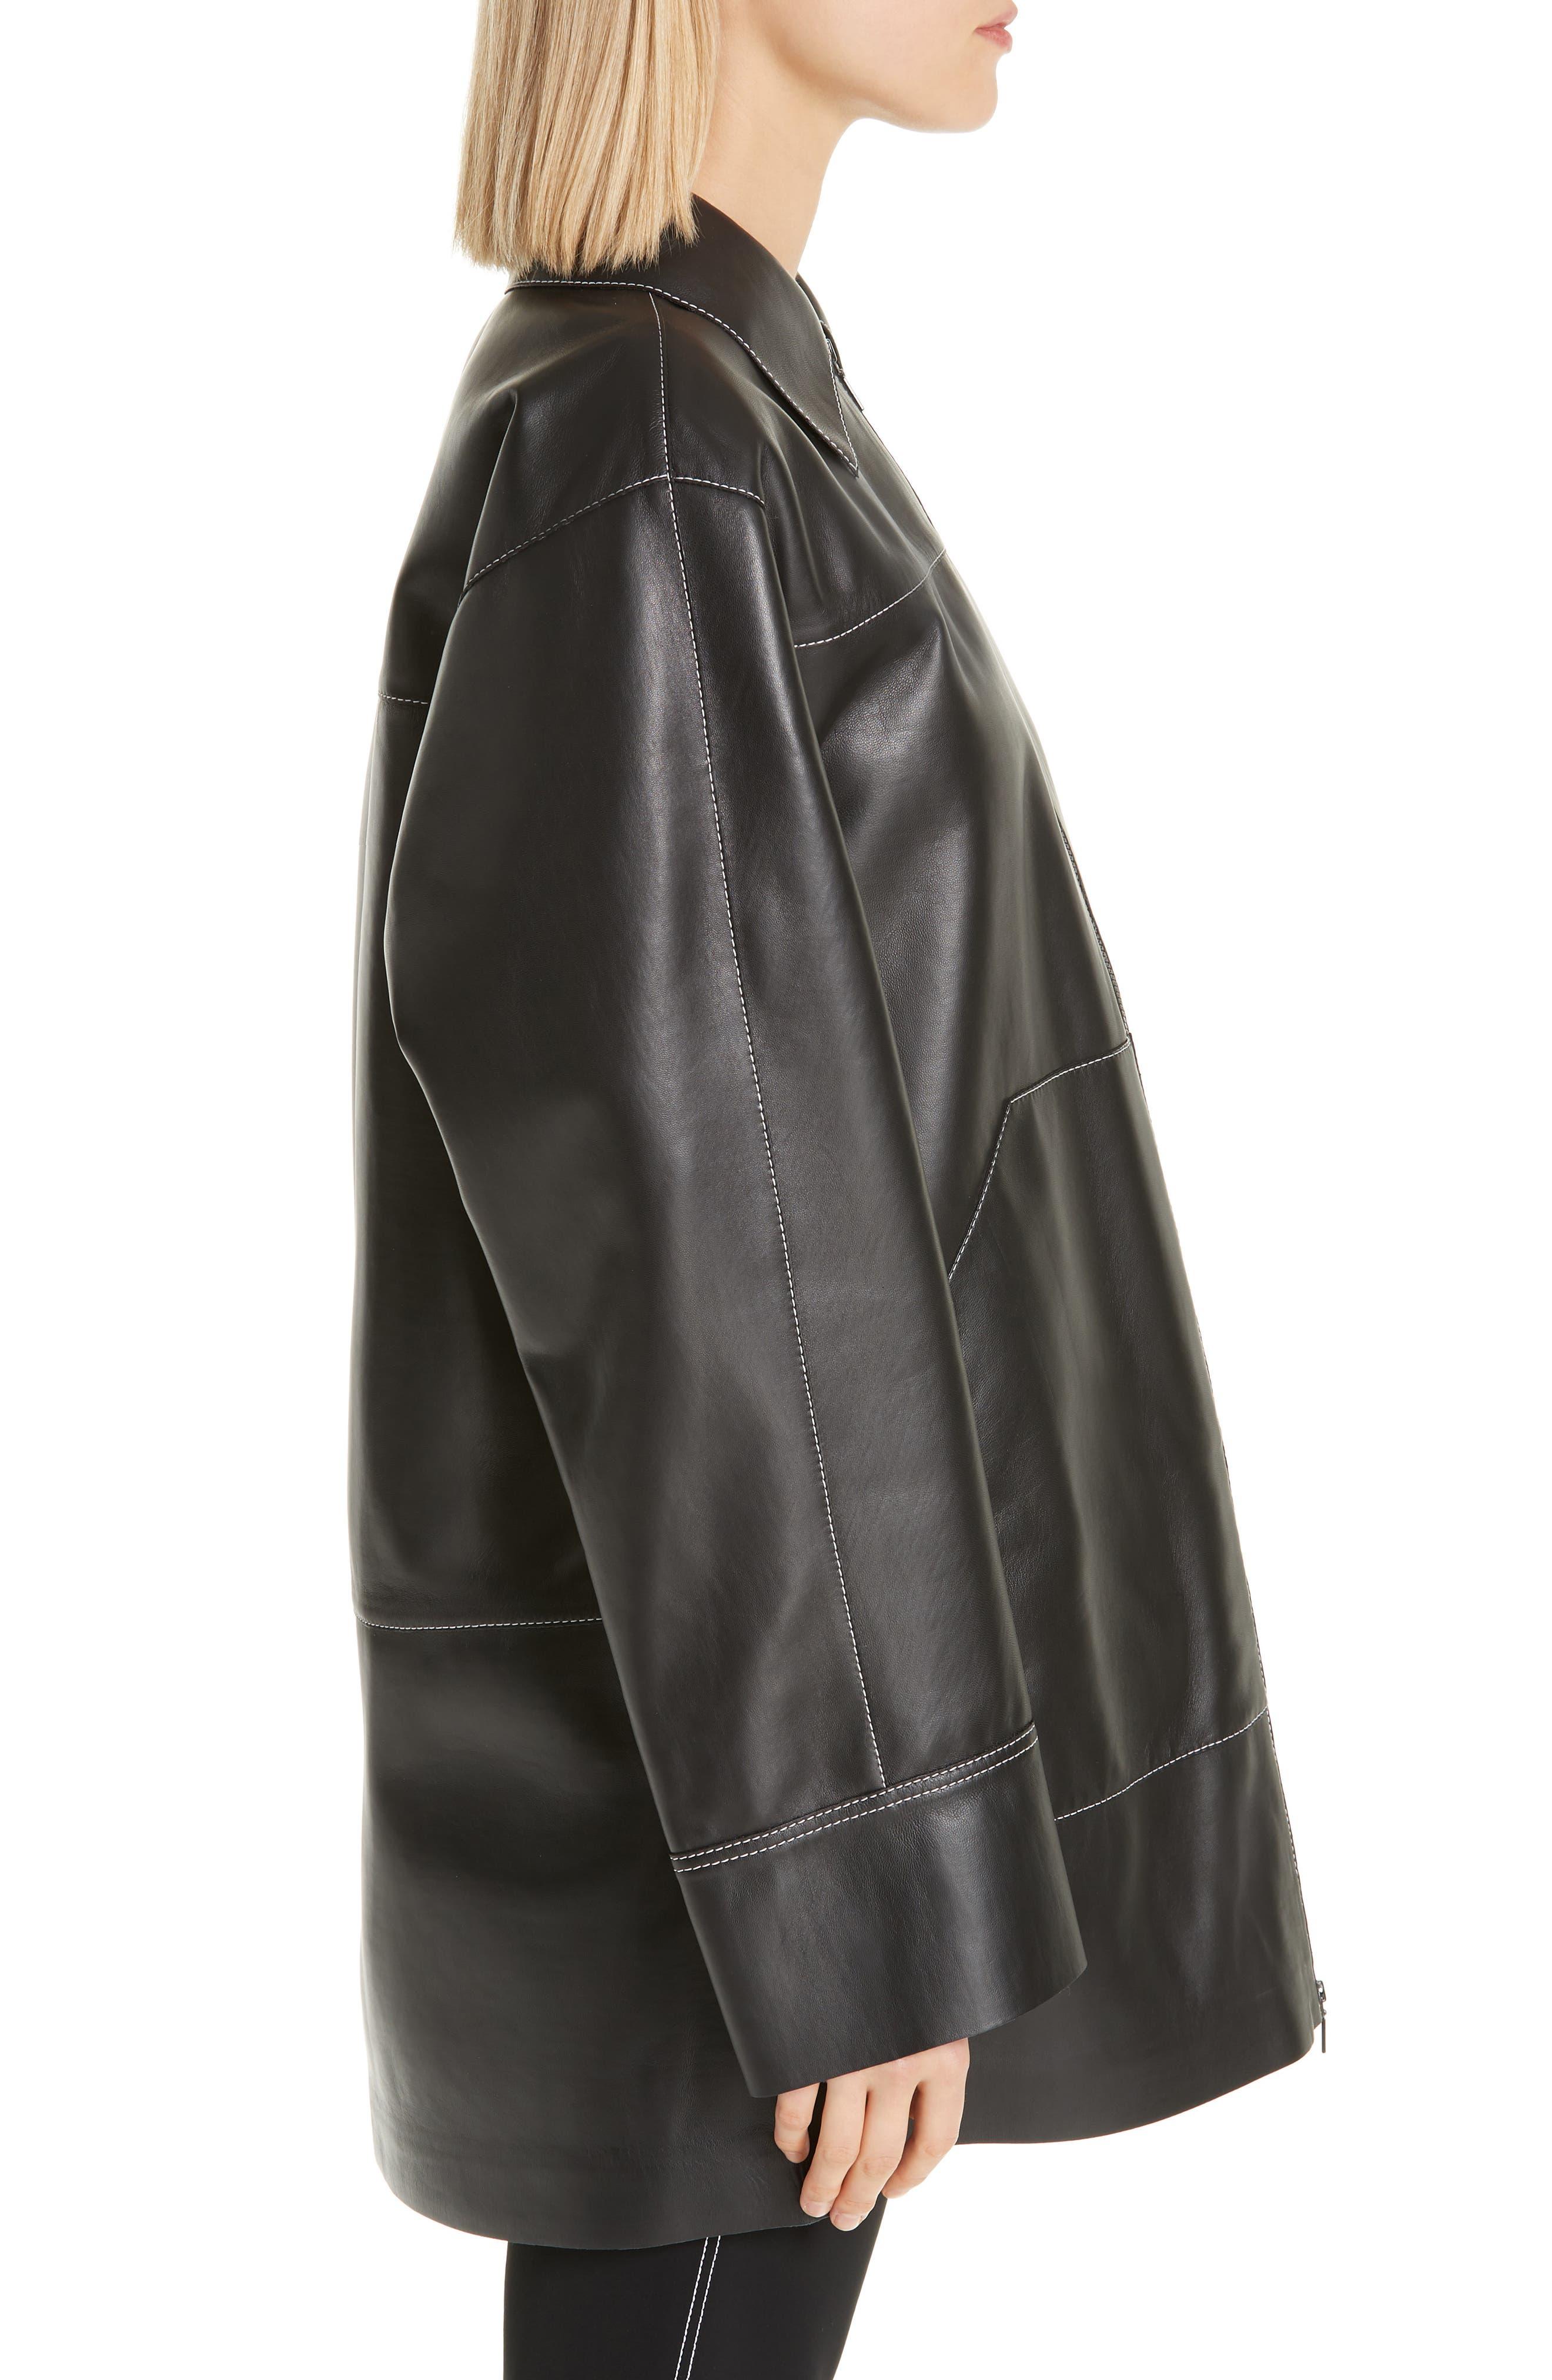 Christopher Leather Jacket,                             Alternate thumbnail 3, color,                             BLACK